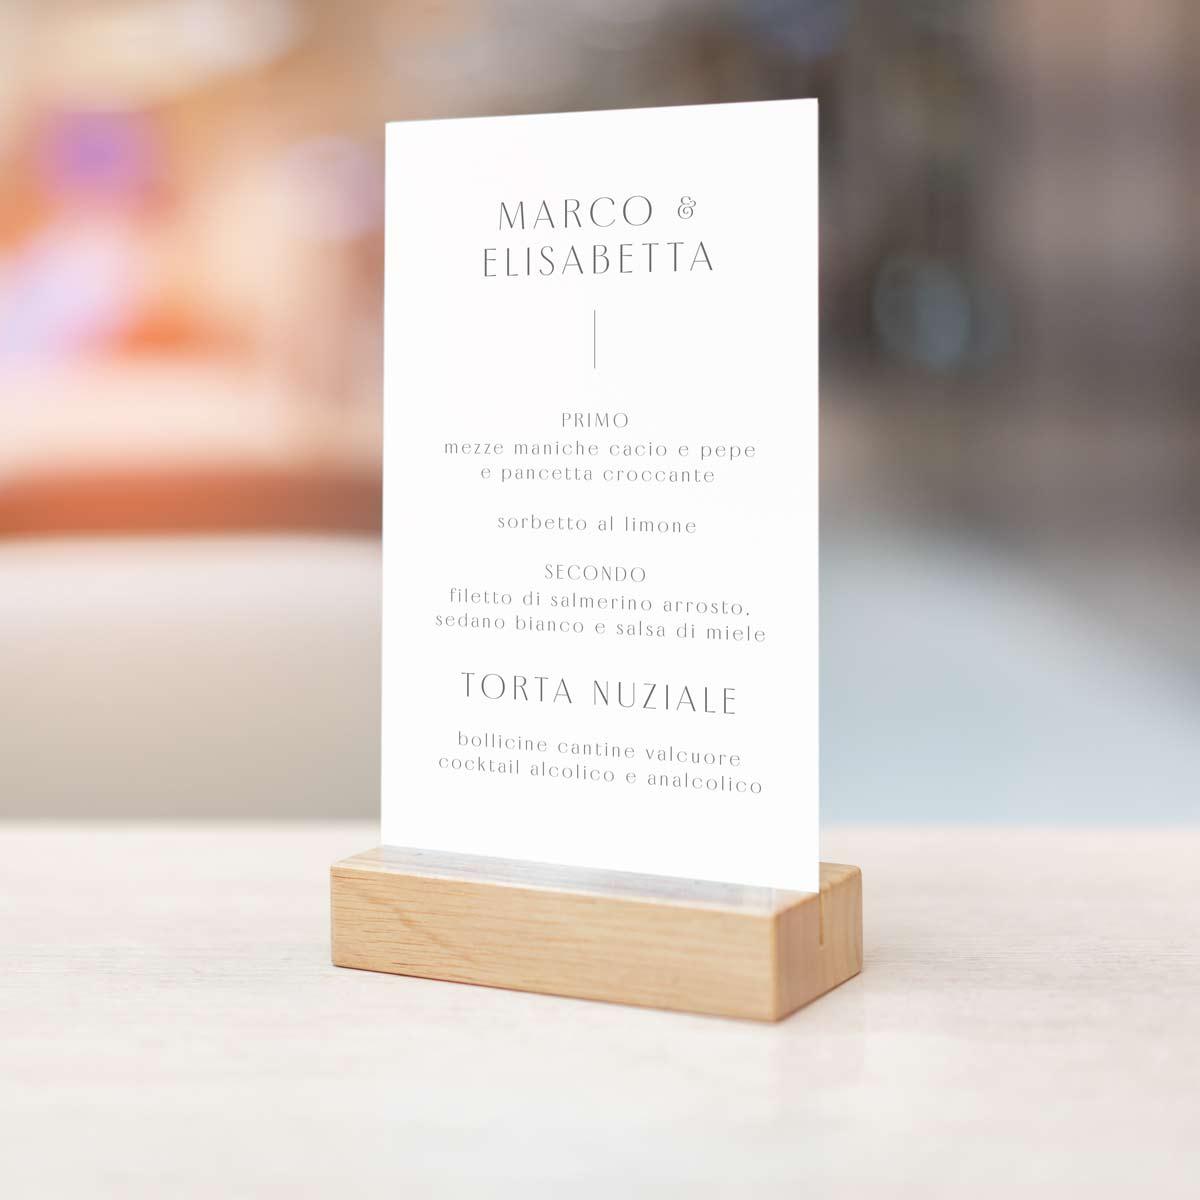 allestimento-matrimoni-matrimonio-cavaliere-menu-segnaposto-tag-tavola-tableau-de-mariage